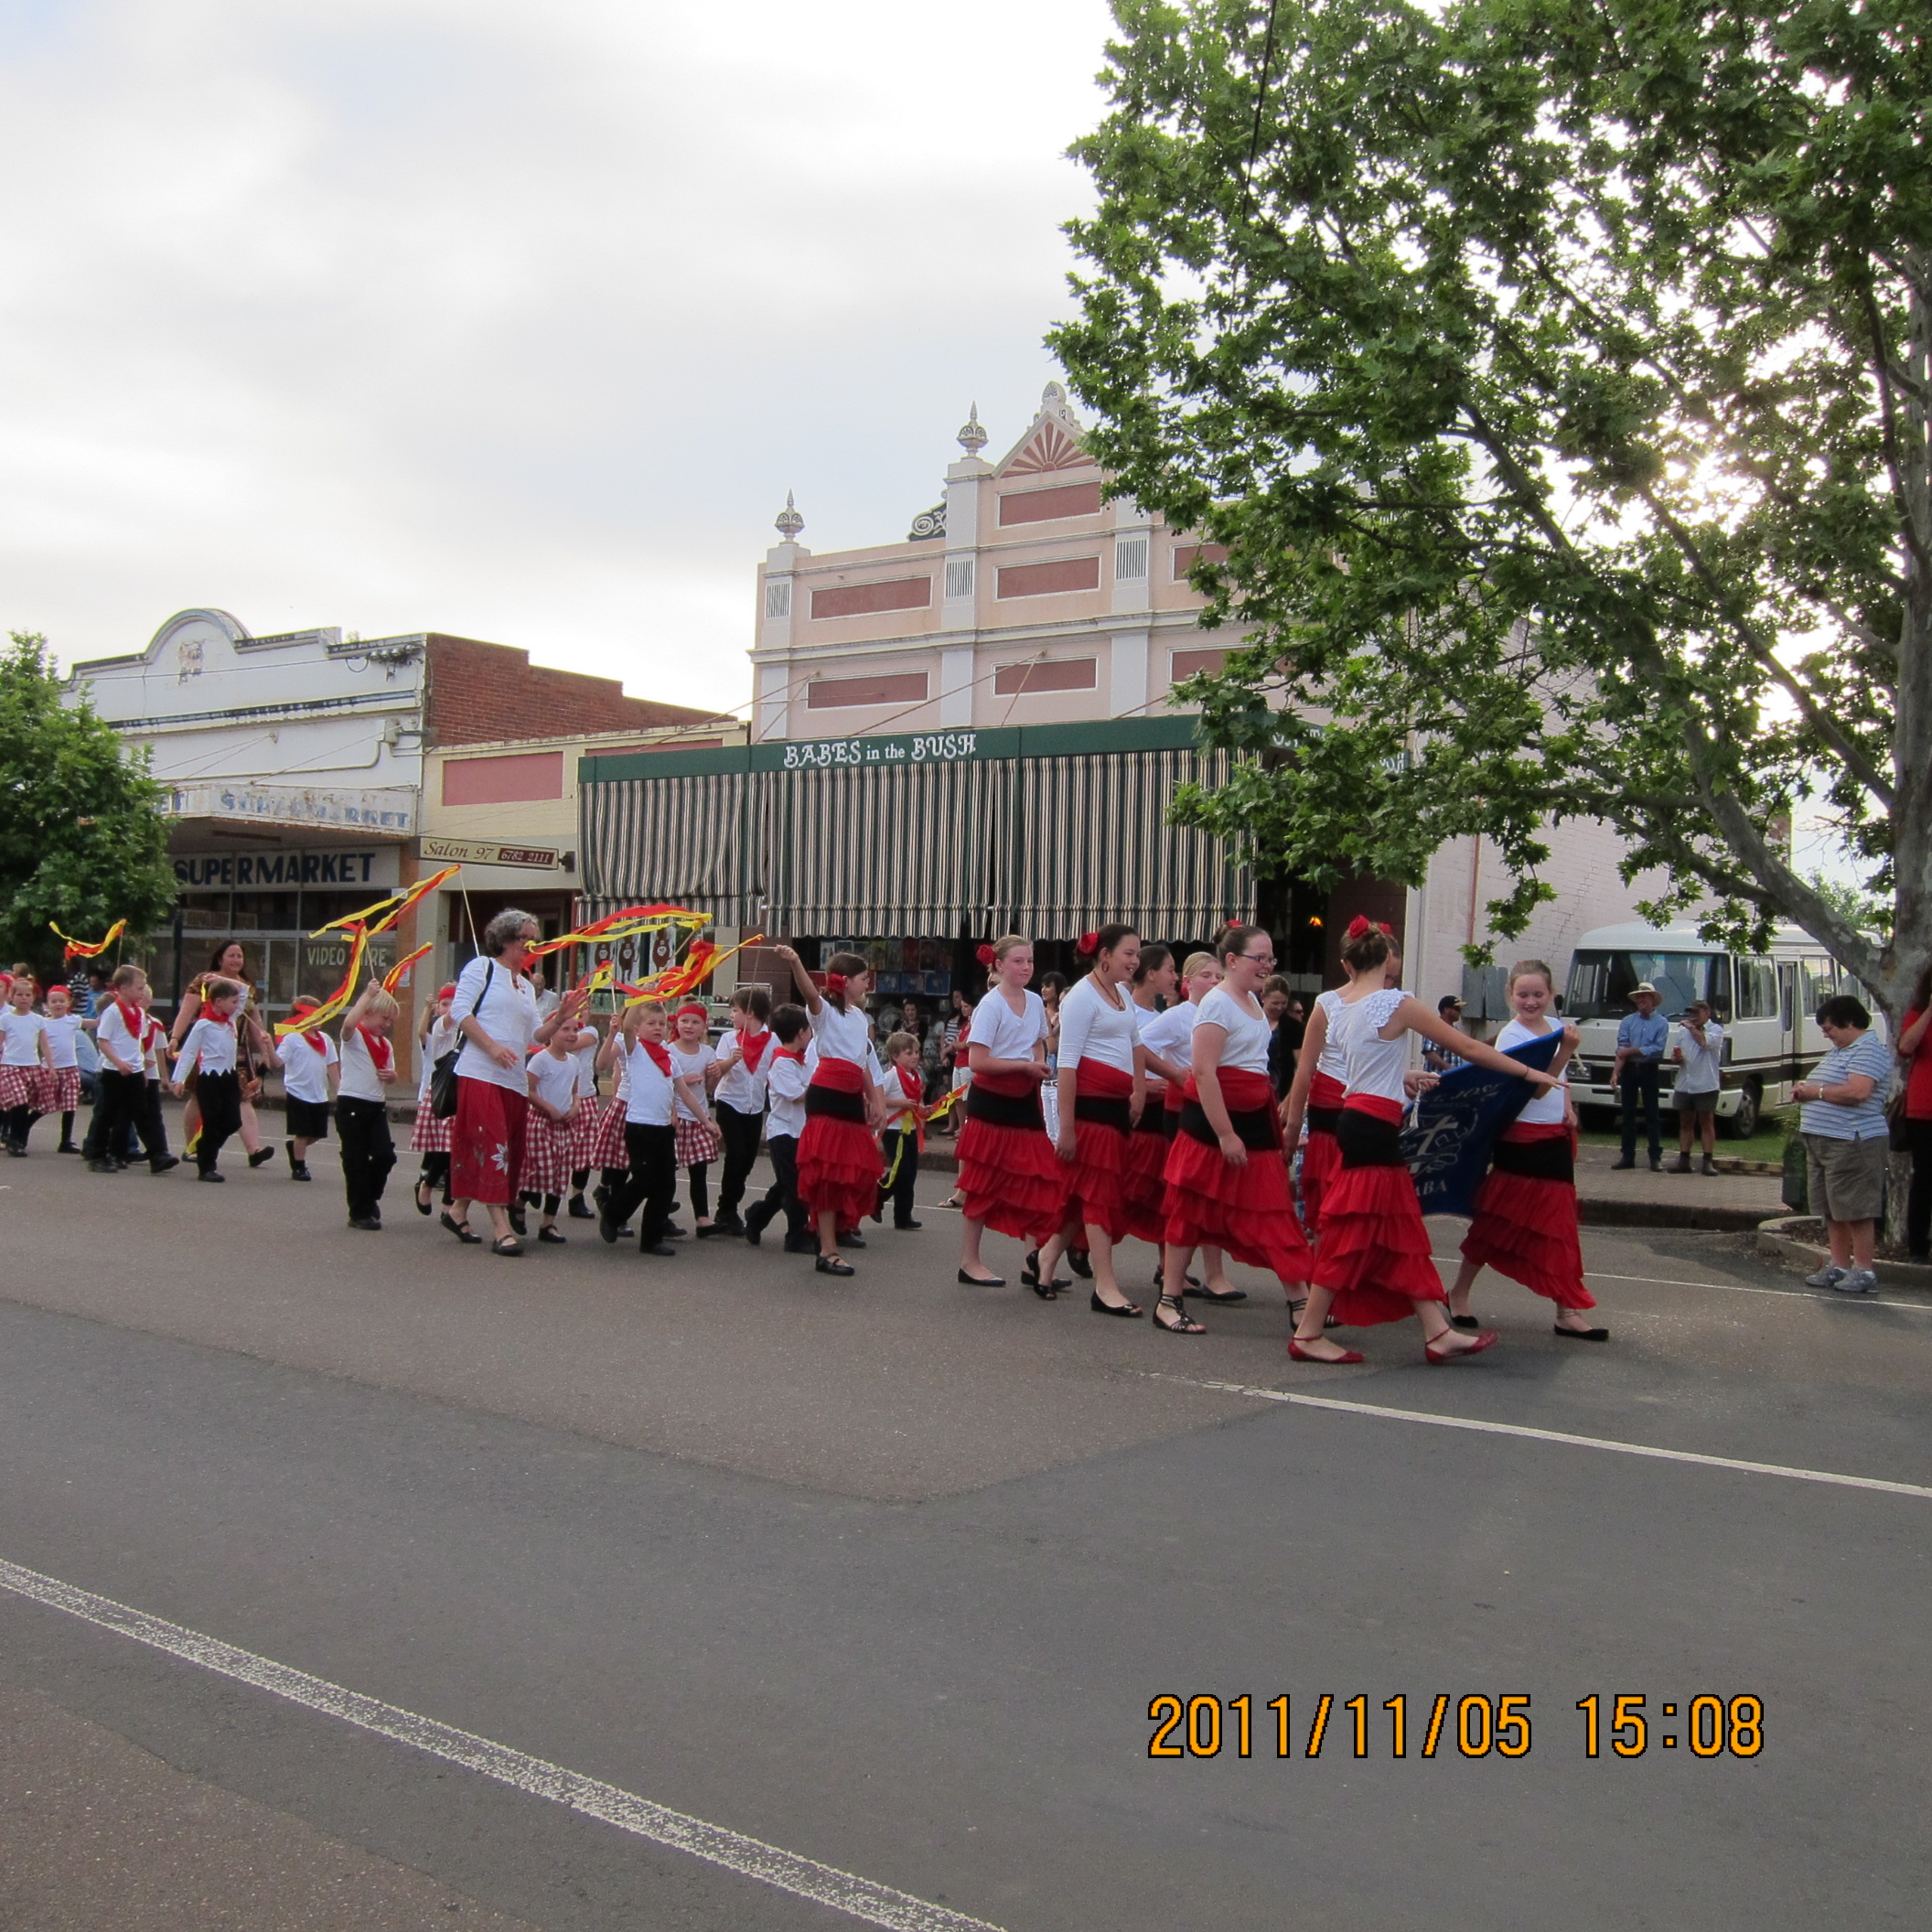 Bararbor Festival